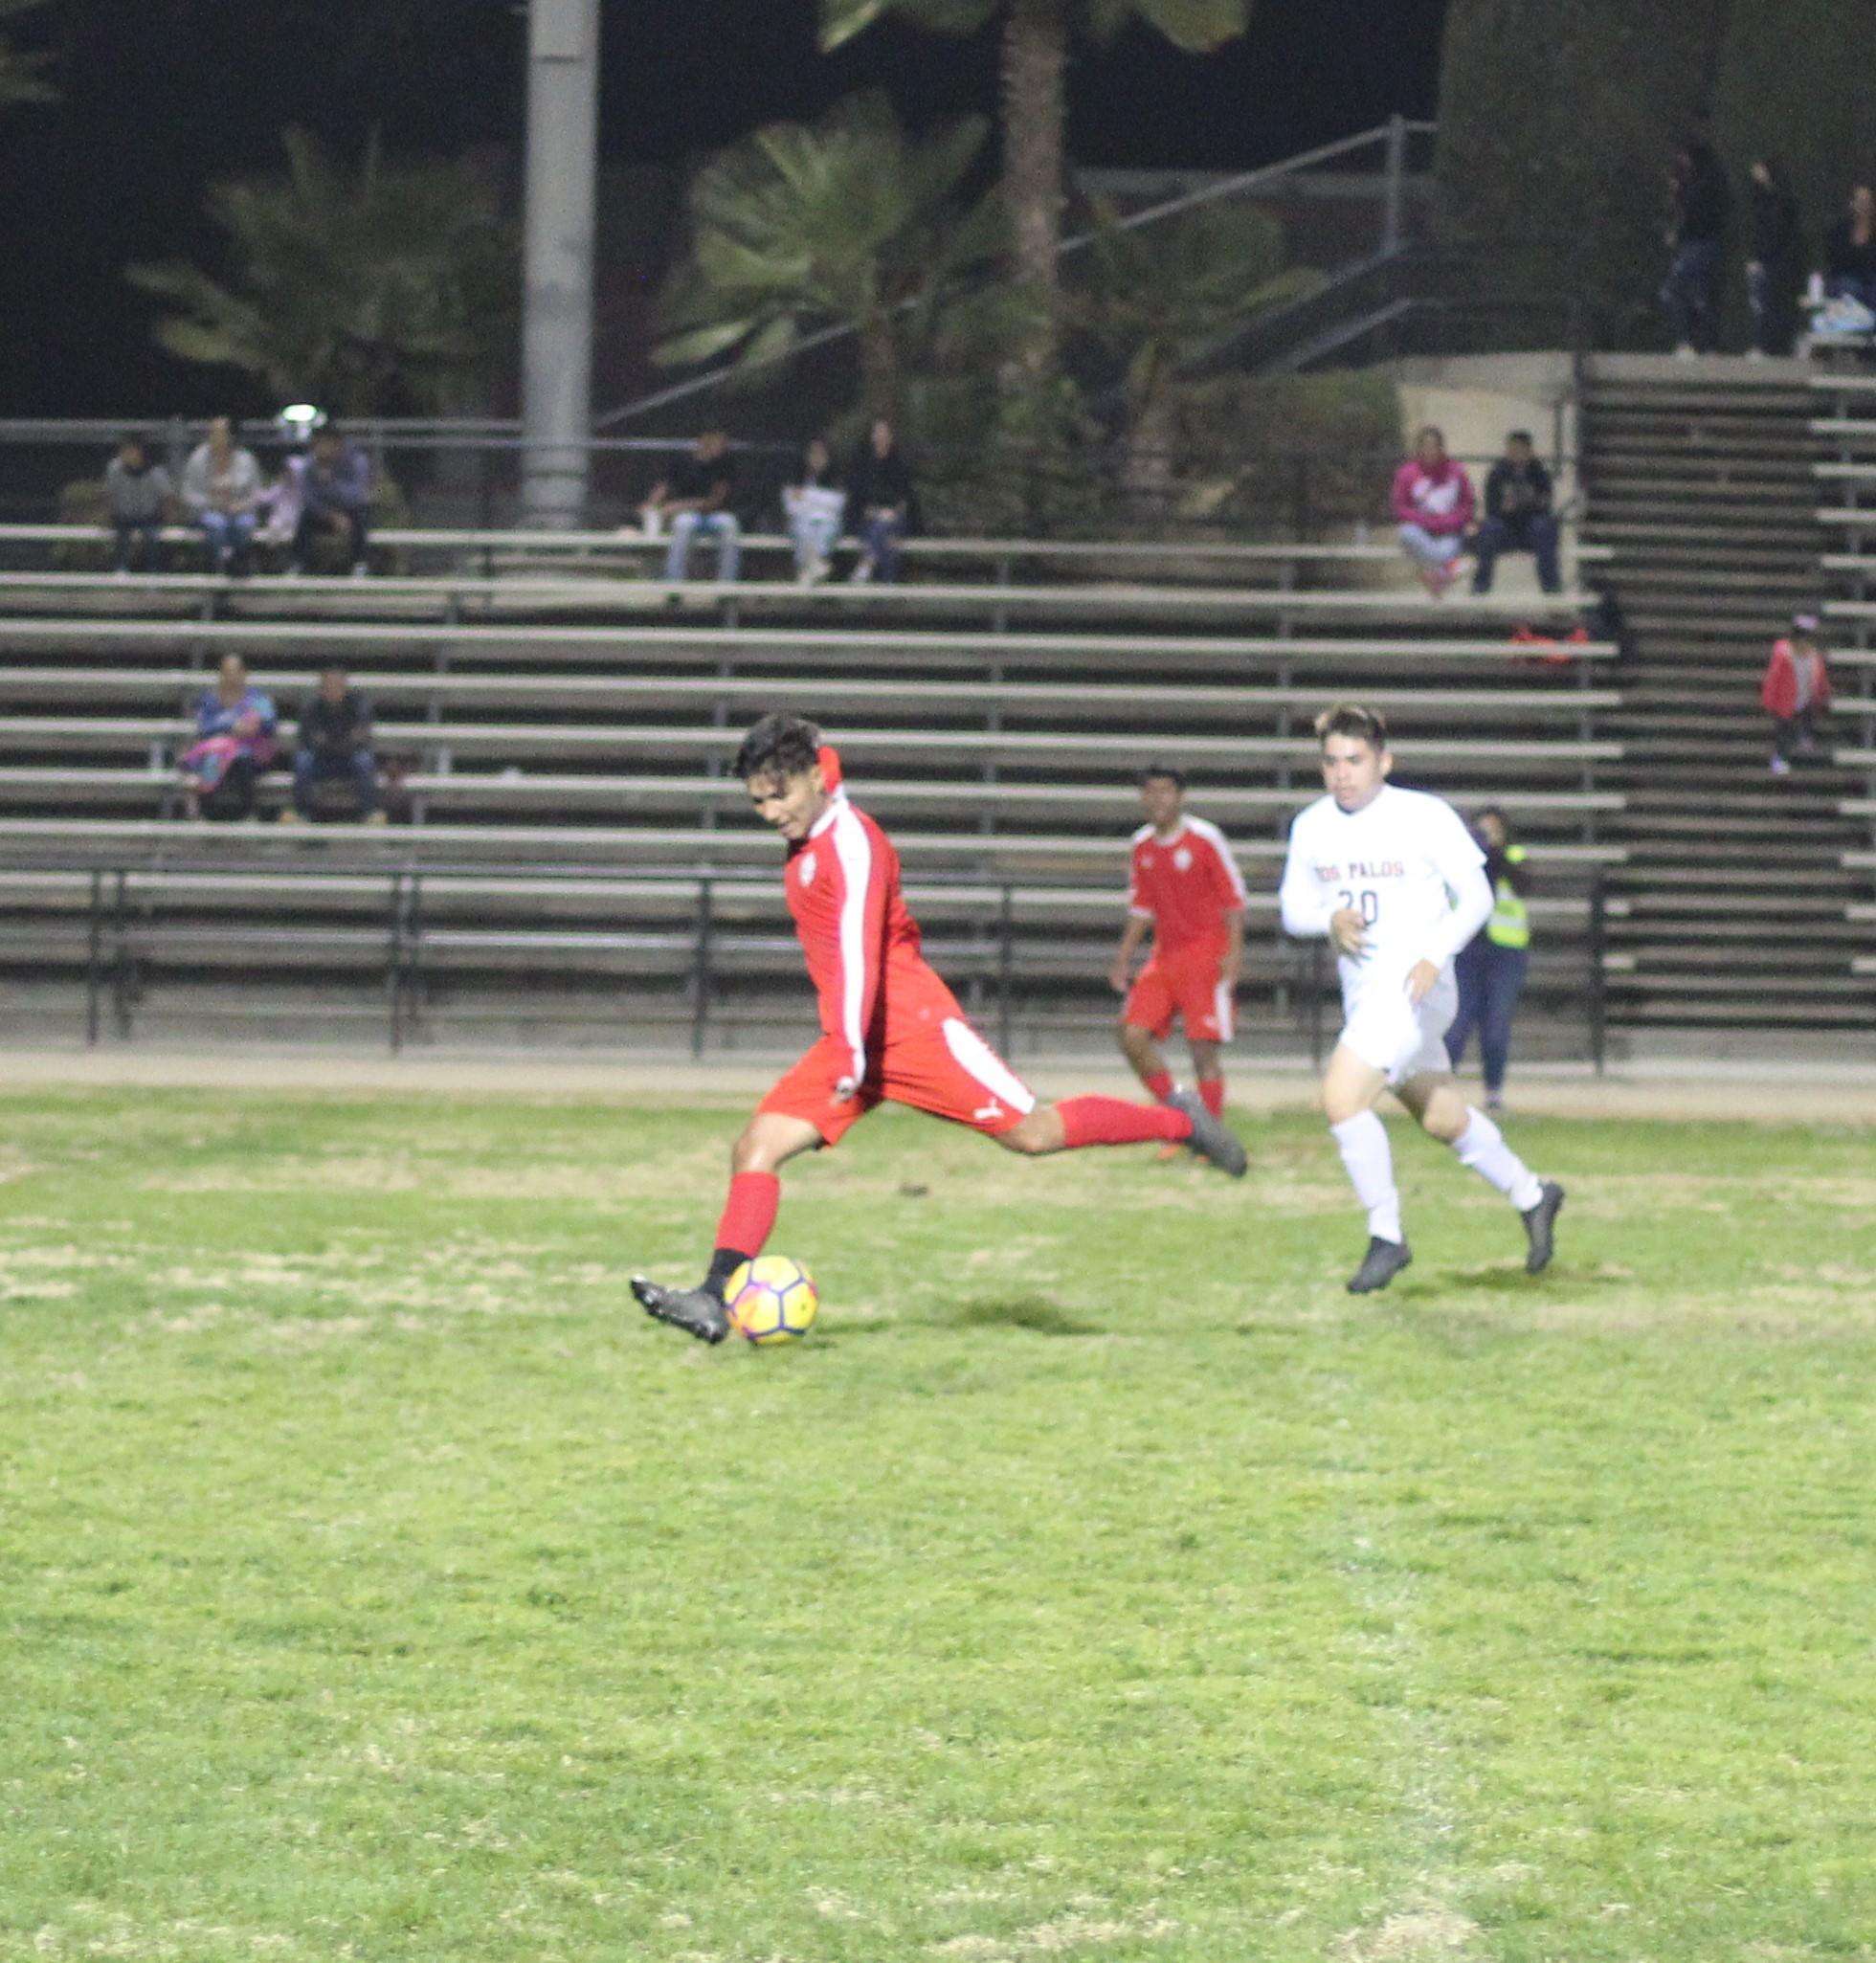 Favian Casillas running with the ball